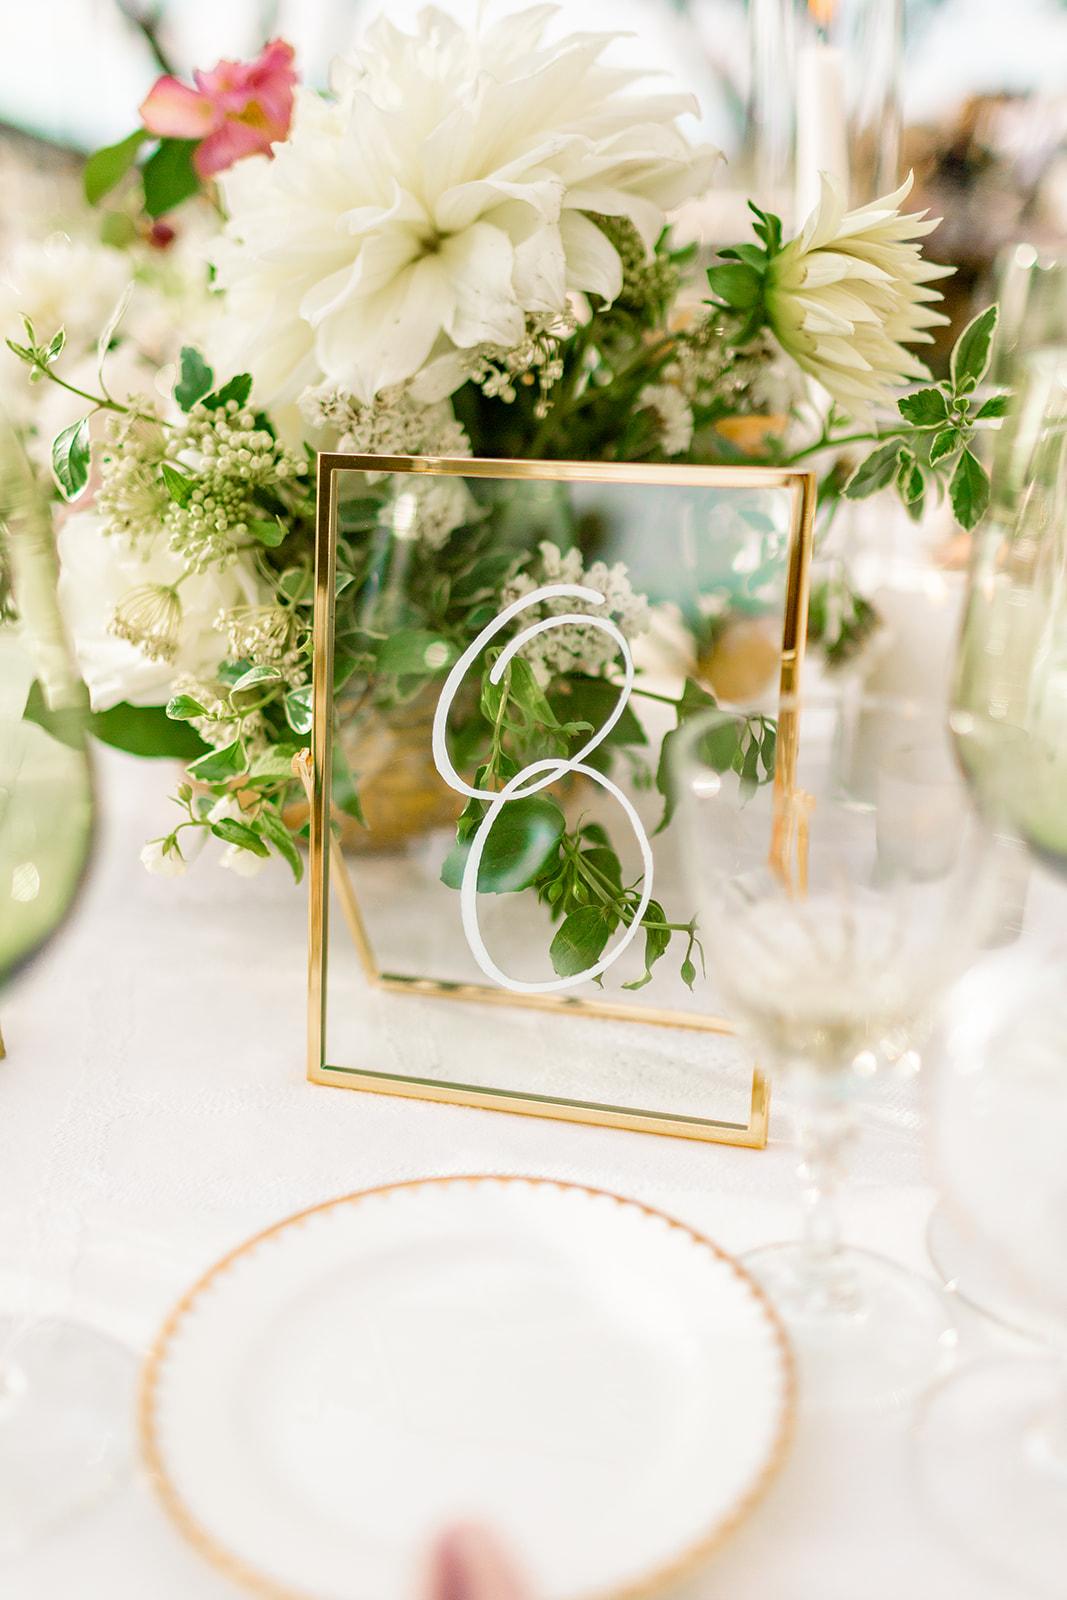 Wedding Table Number - Natalie Schutt Photography.jpg